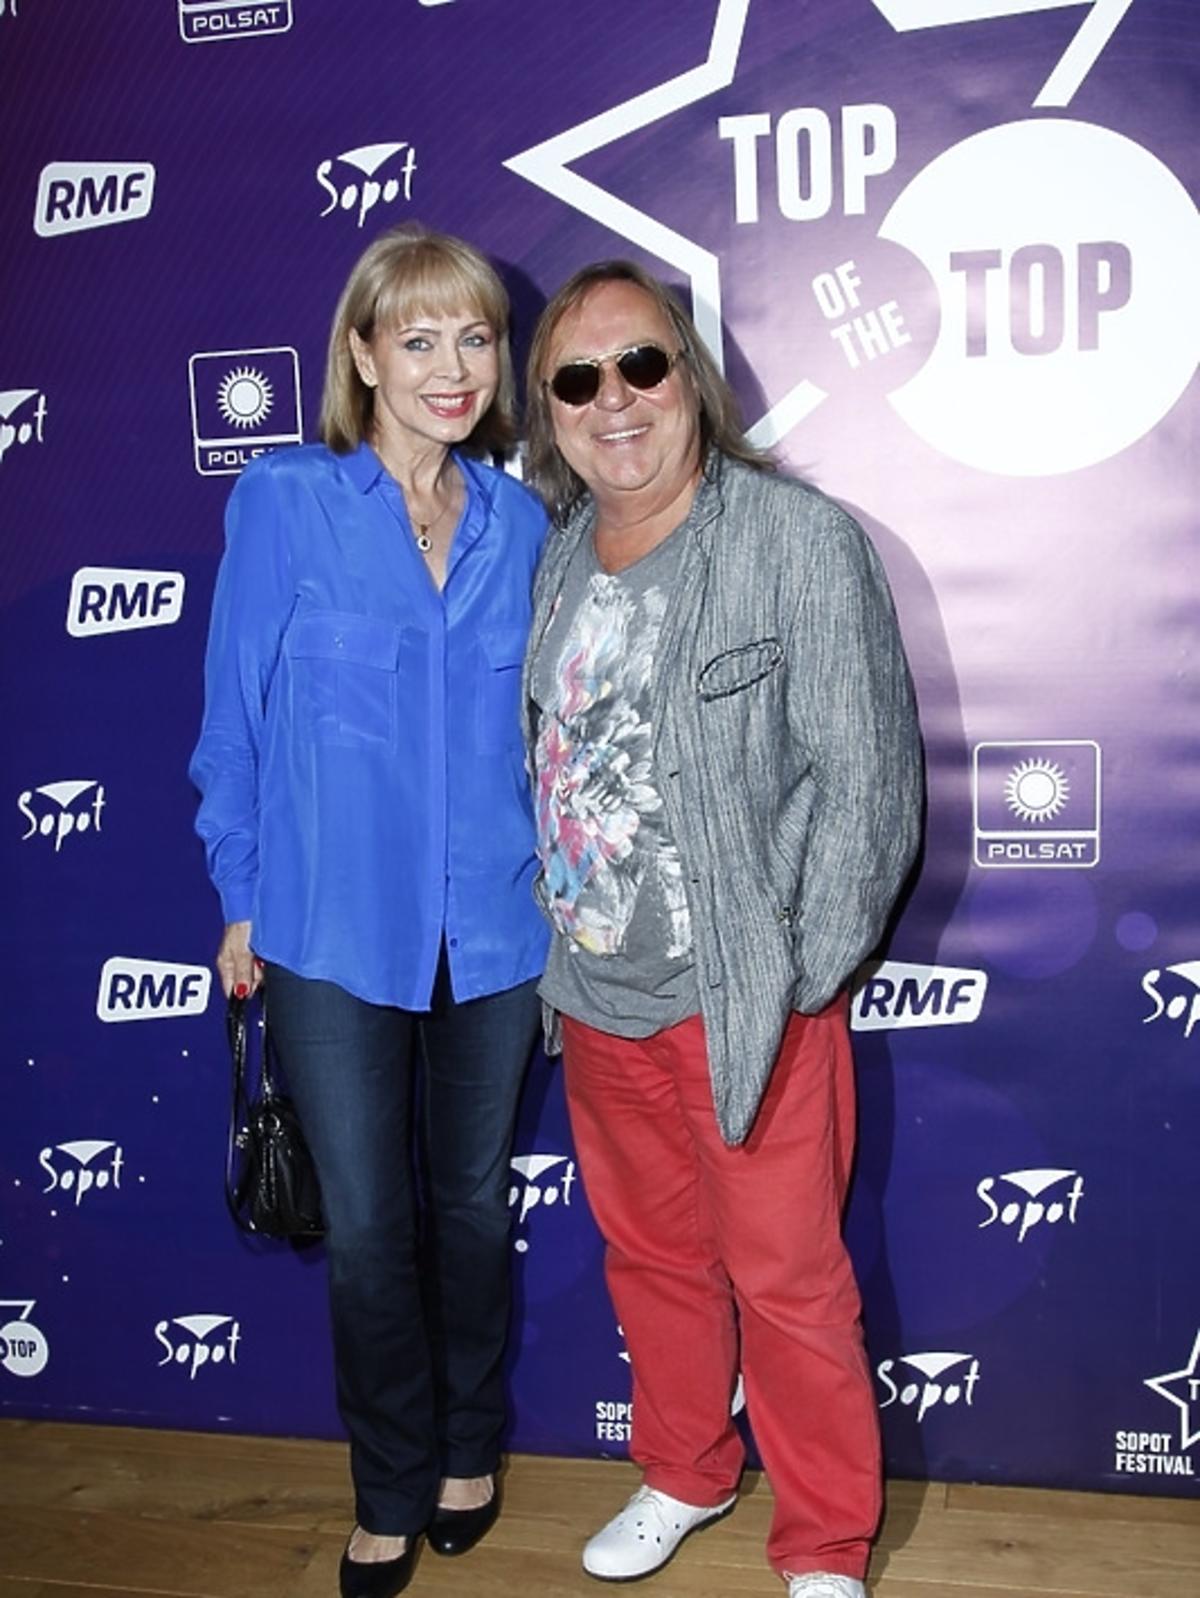 Izabela Trojanowska i Romuald Lipko na festiwalu Top of the Top 2013 w Sopocie